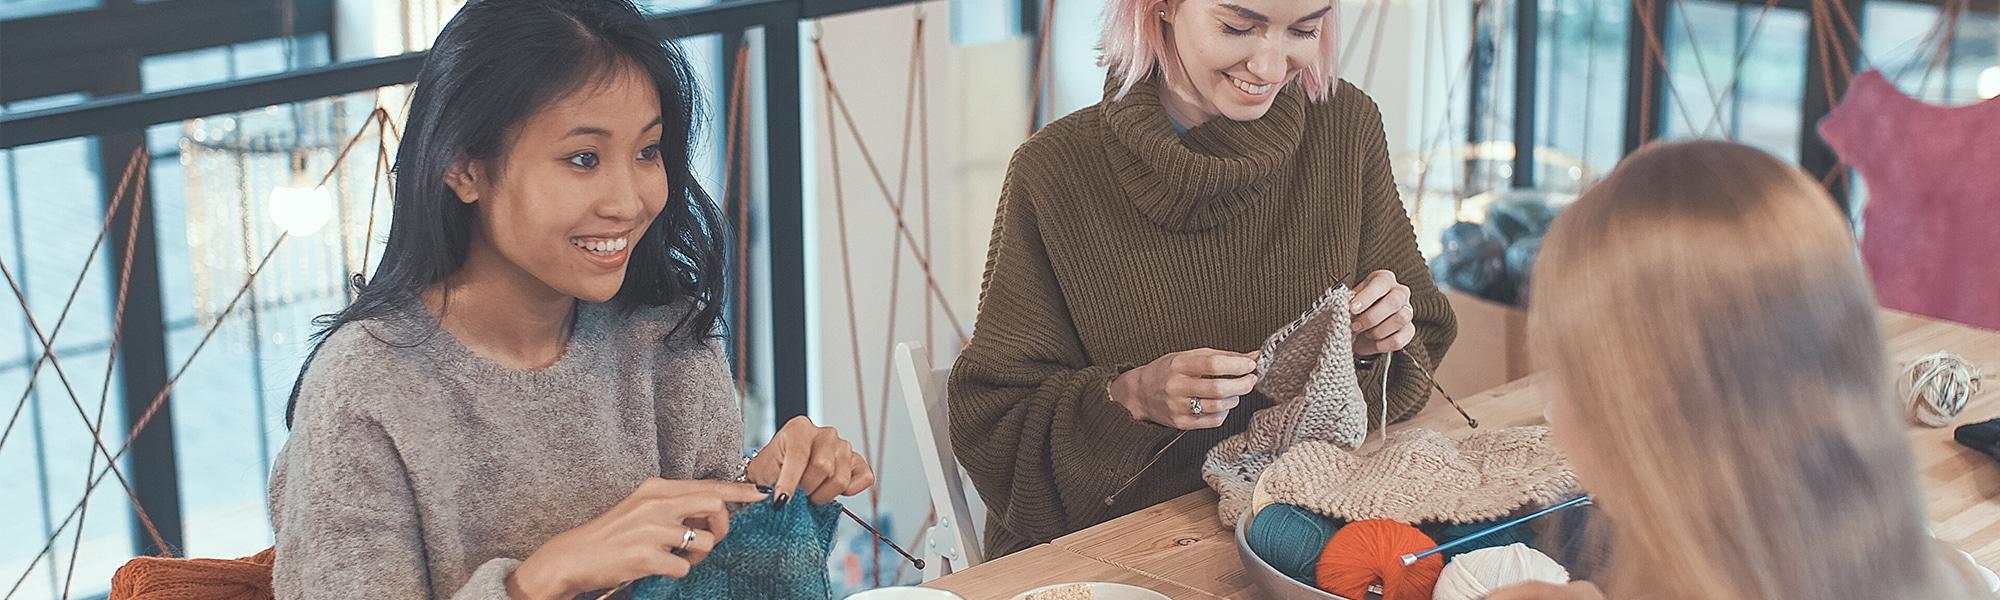 Maker Culture is Mending Retail